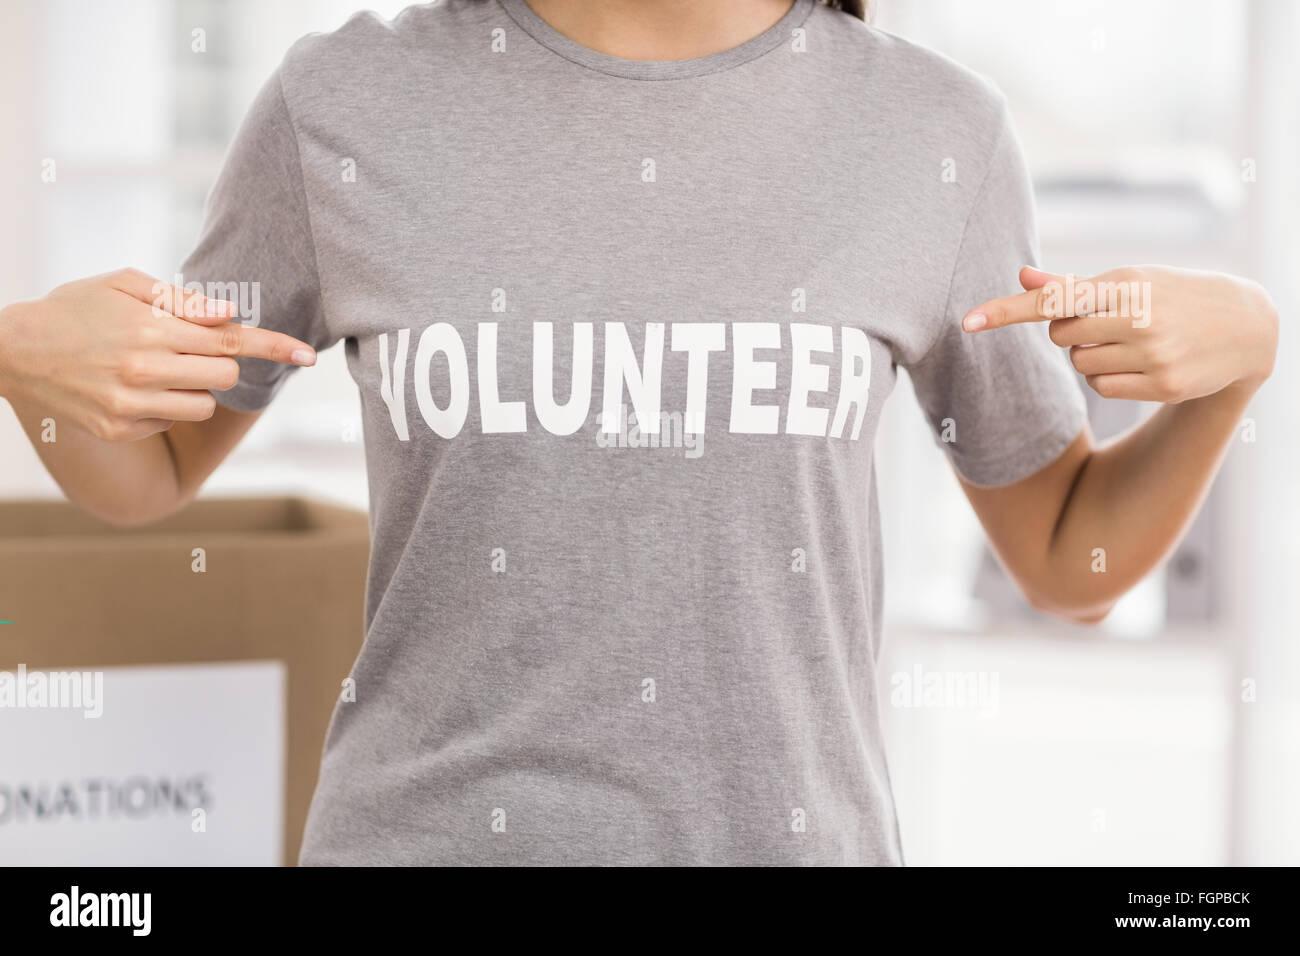 Female volunteer showing her shirt - Stock Image